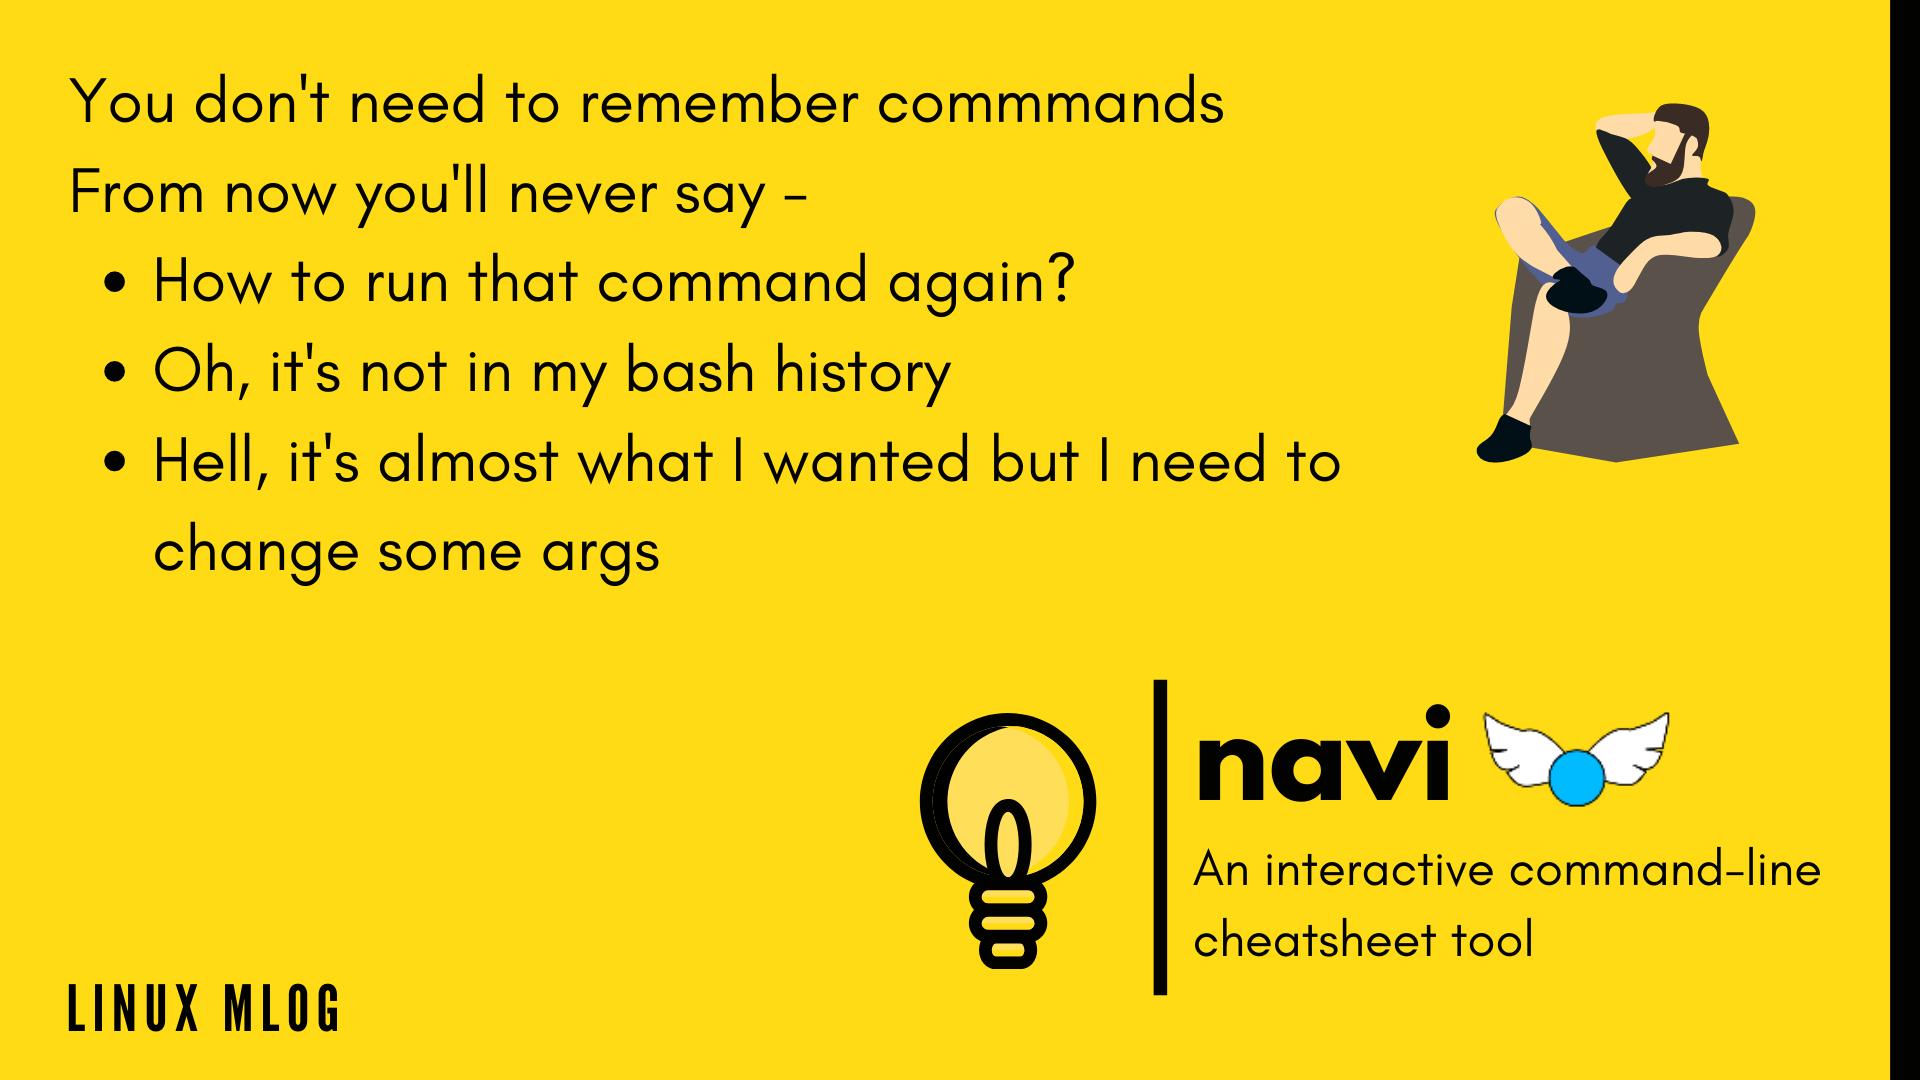 Navi - An interactive commandline cheatsheet tool